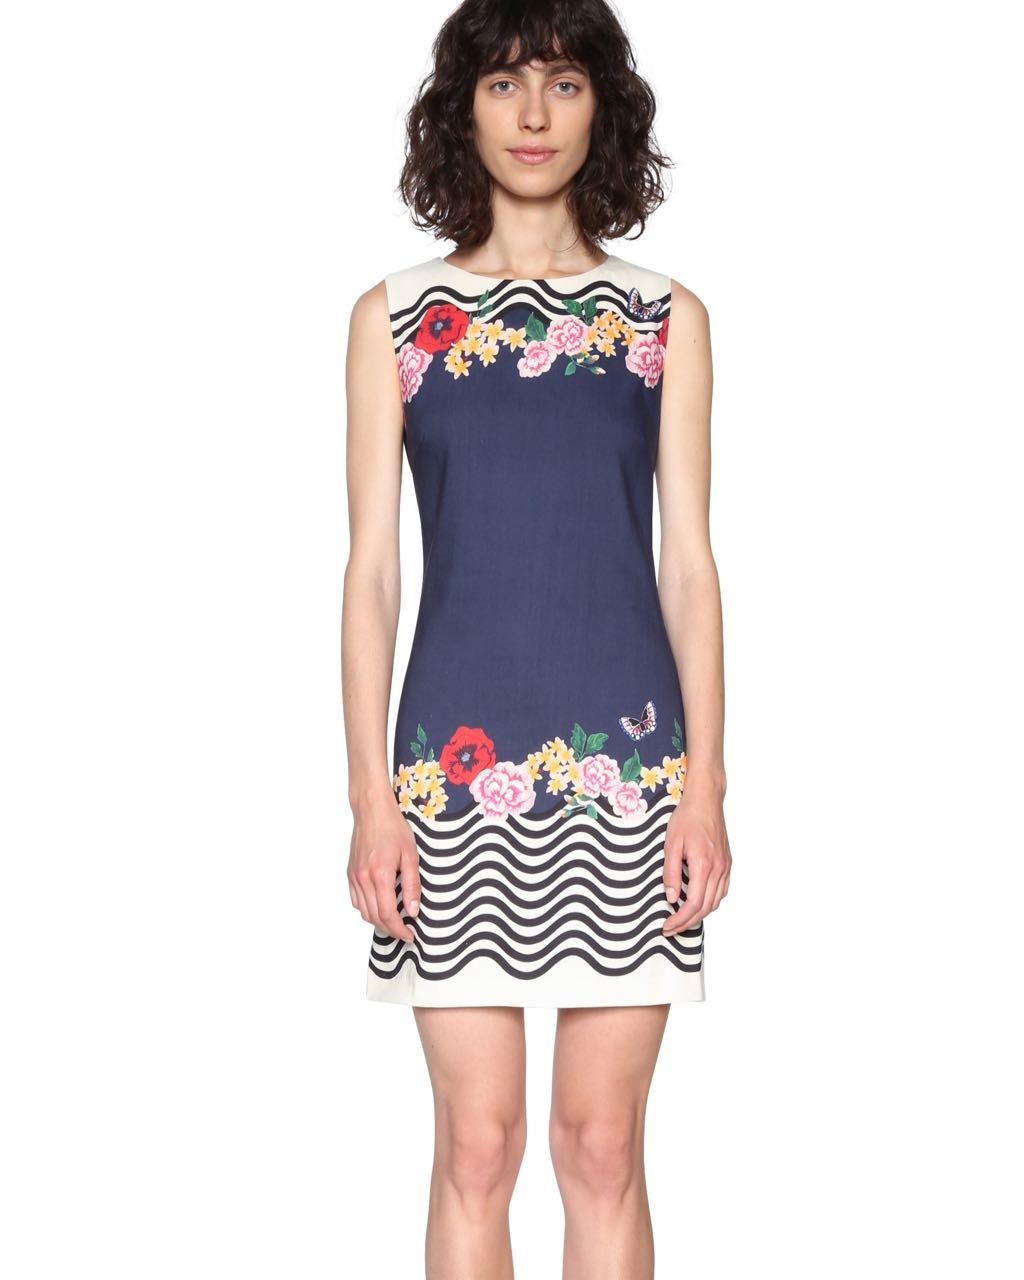 18SWVWCL_5001 Desigual Dress Prudencia Buy Online